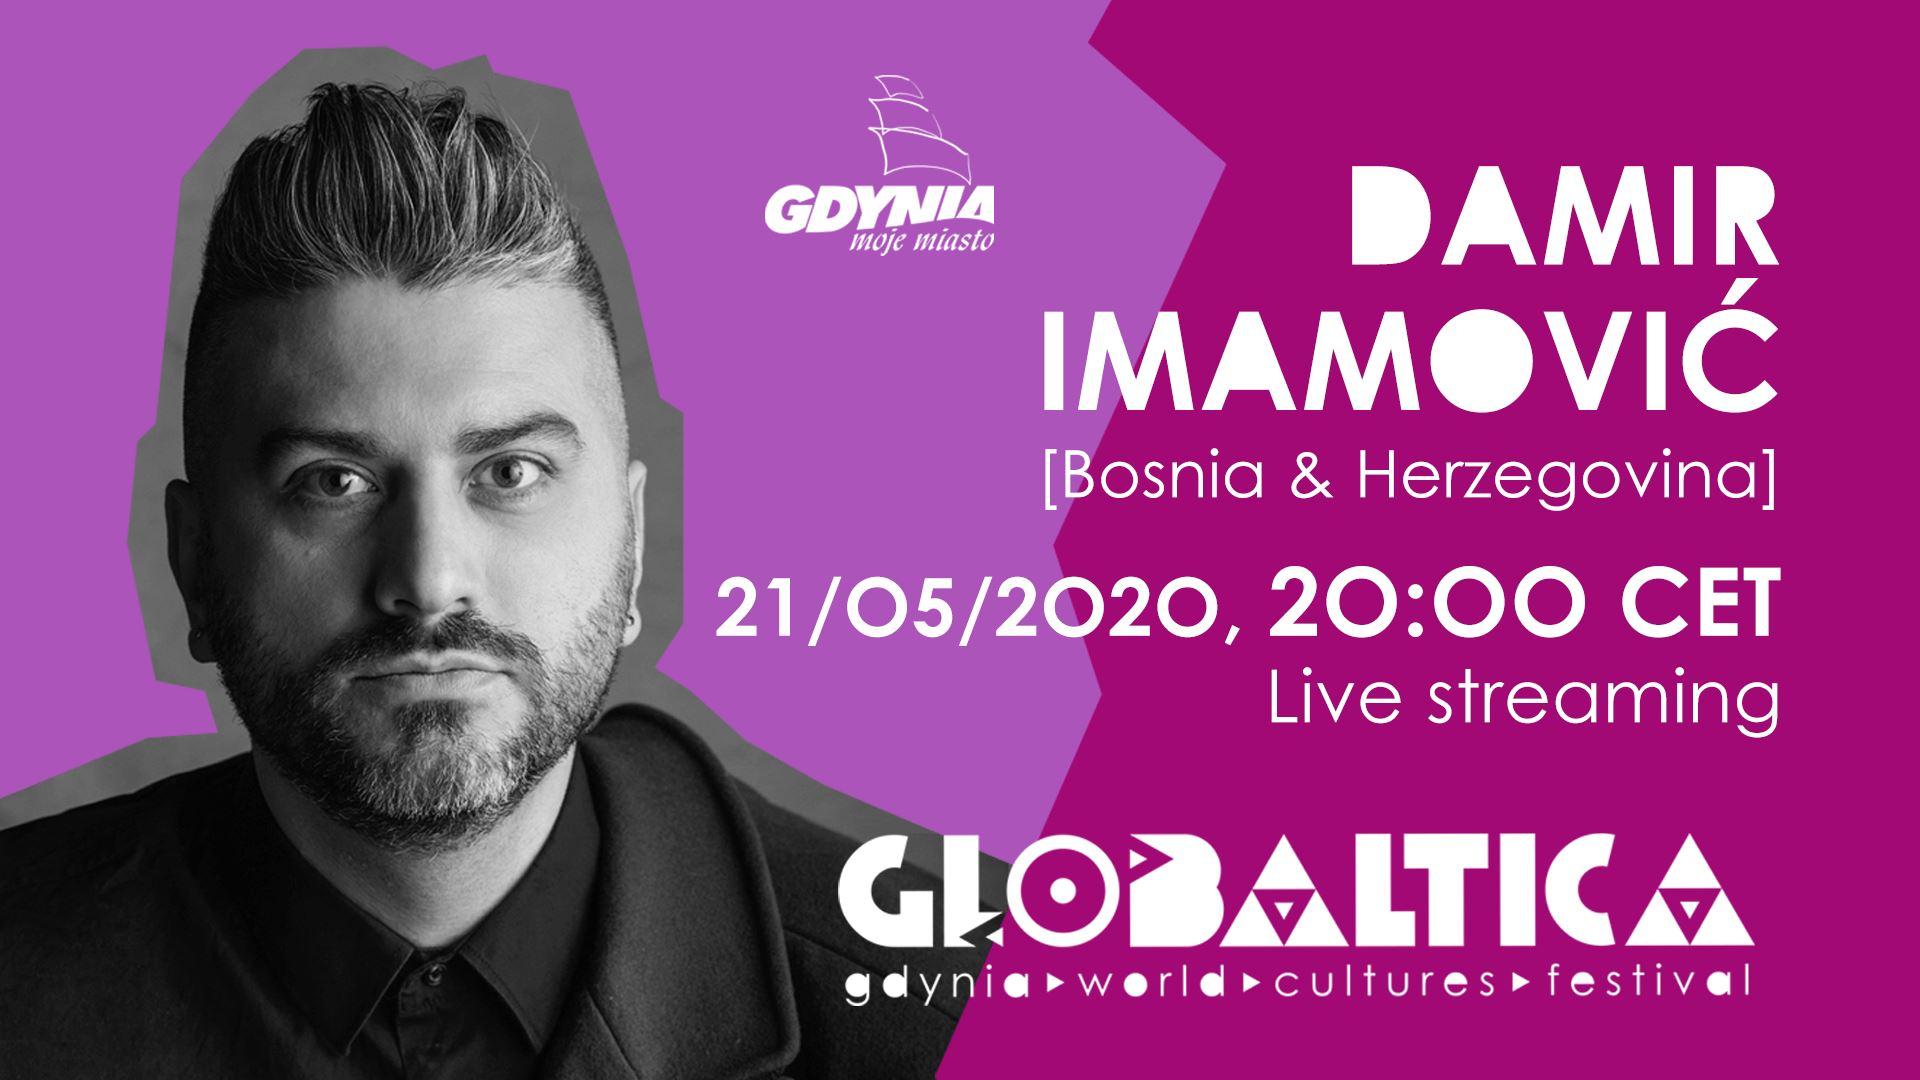 Globaltica online: Damir Imamović